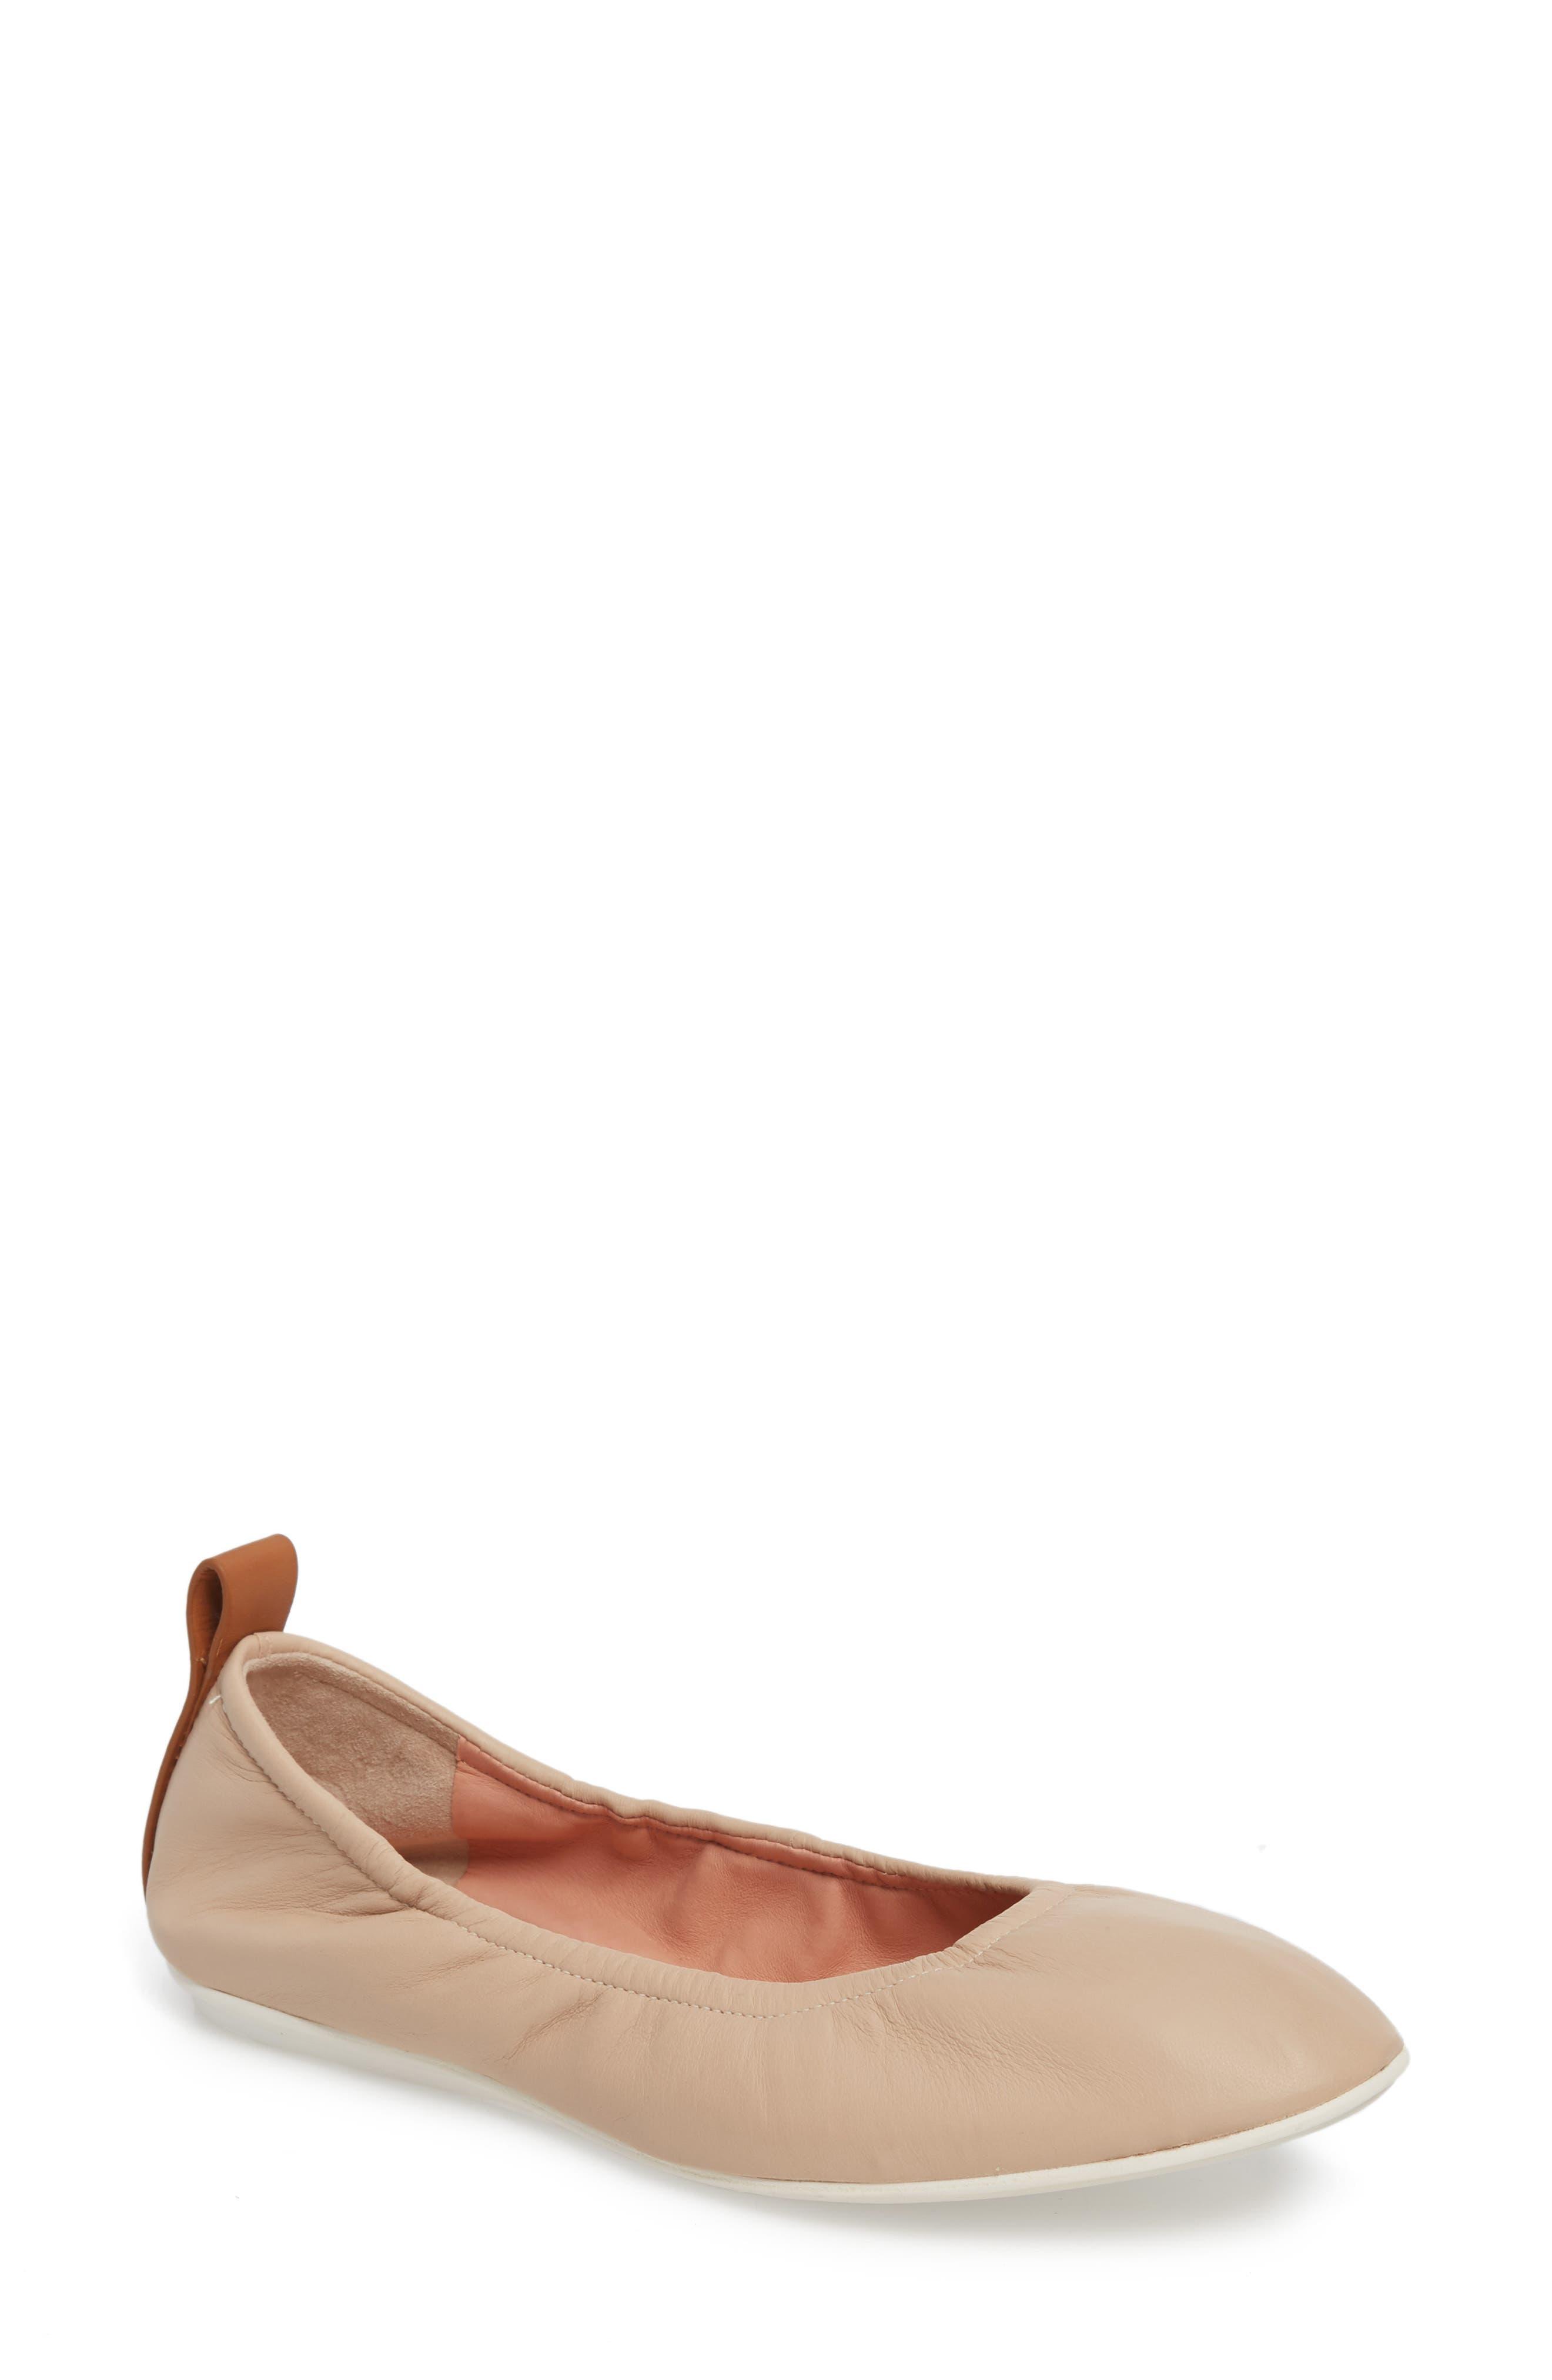 Carola Ballet Flat,                             Main thumbnail 6, color,